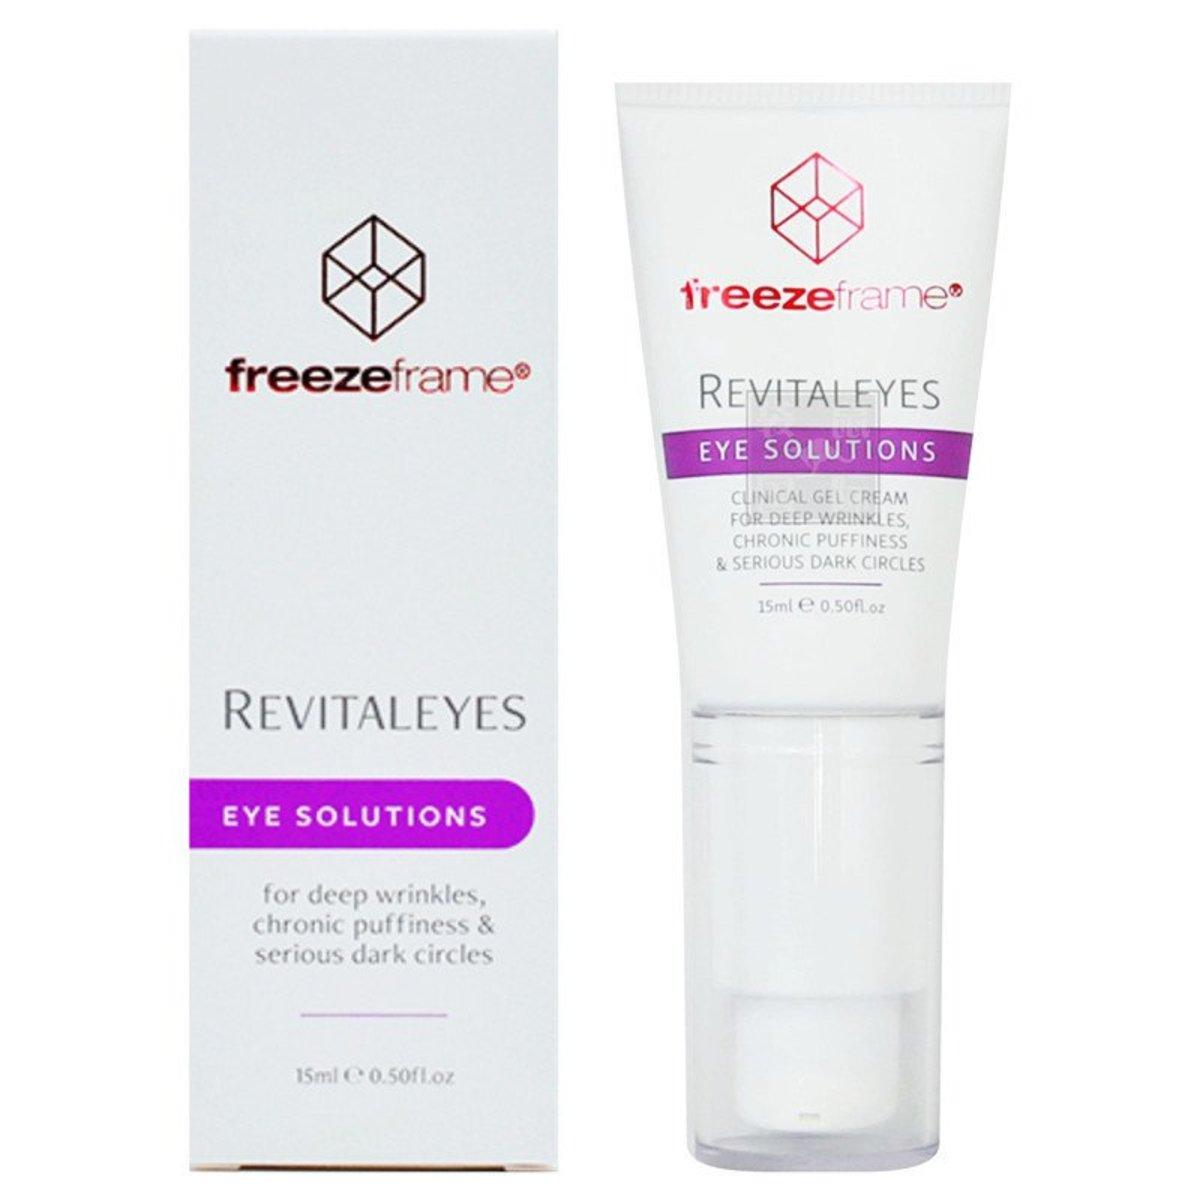 澳洲 freezeframe REVITALEYE Eye Solutions 緊緻全效神奇眼霜15ml